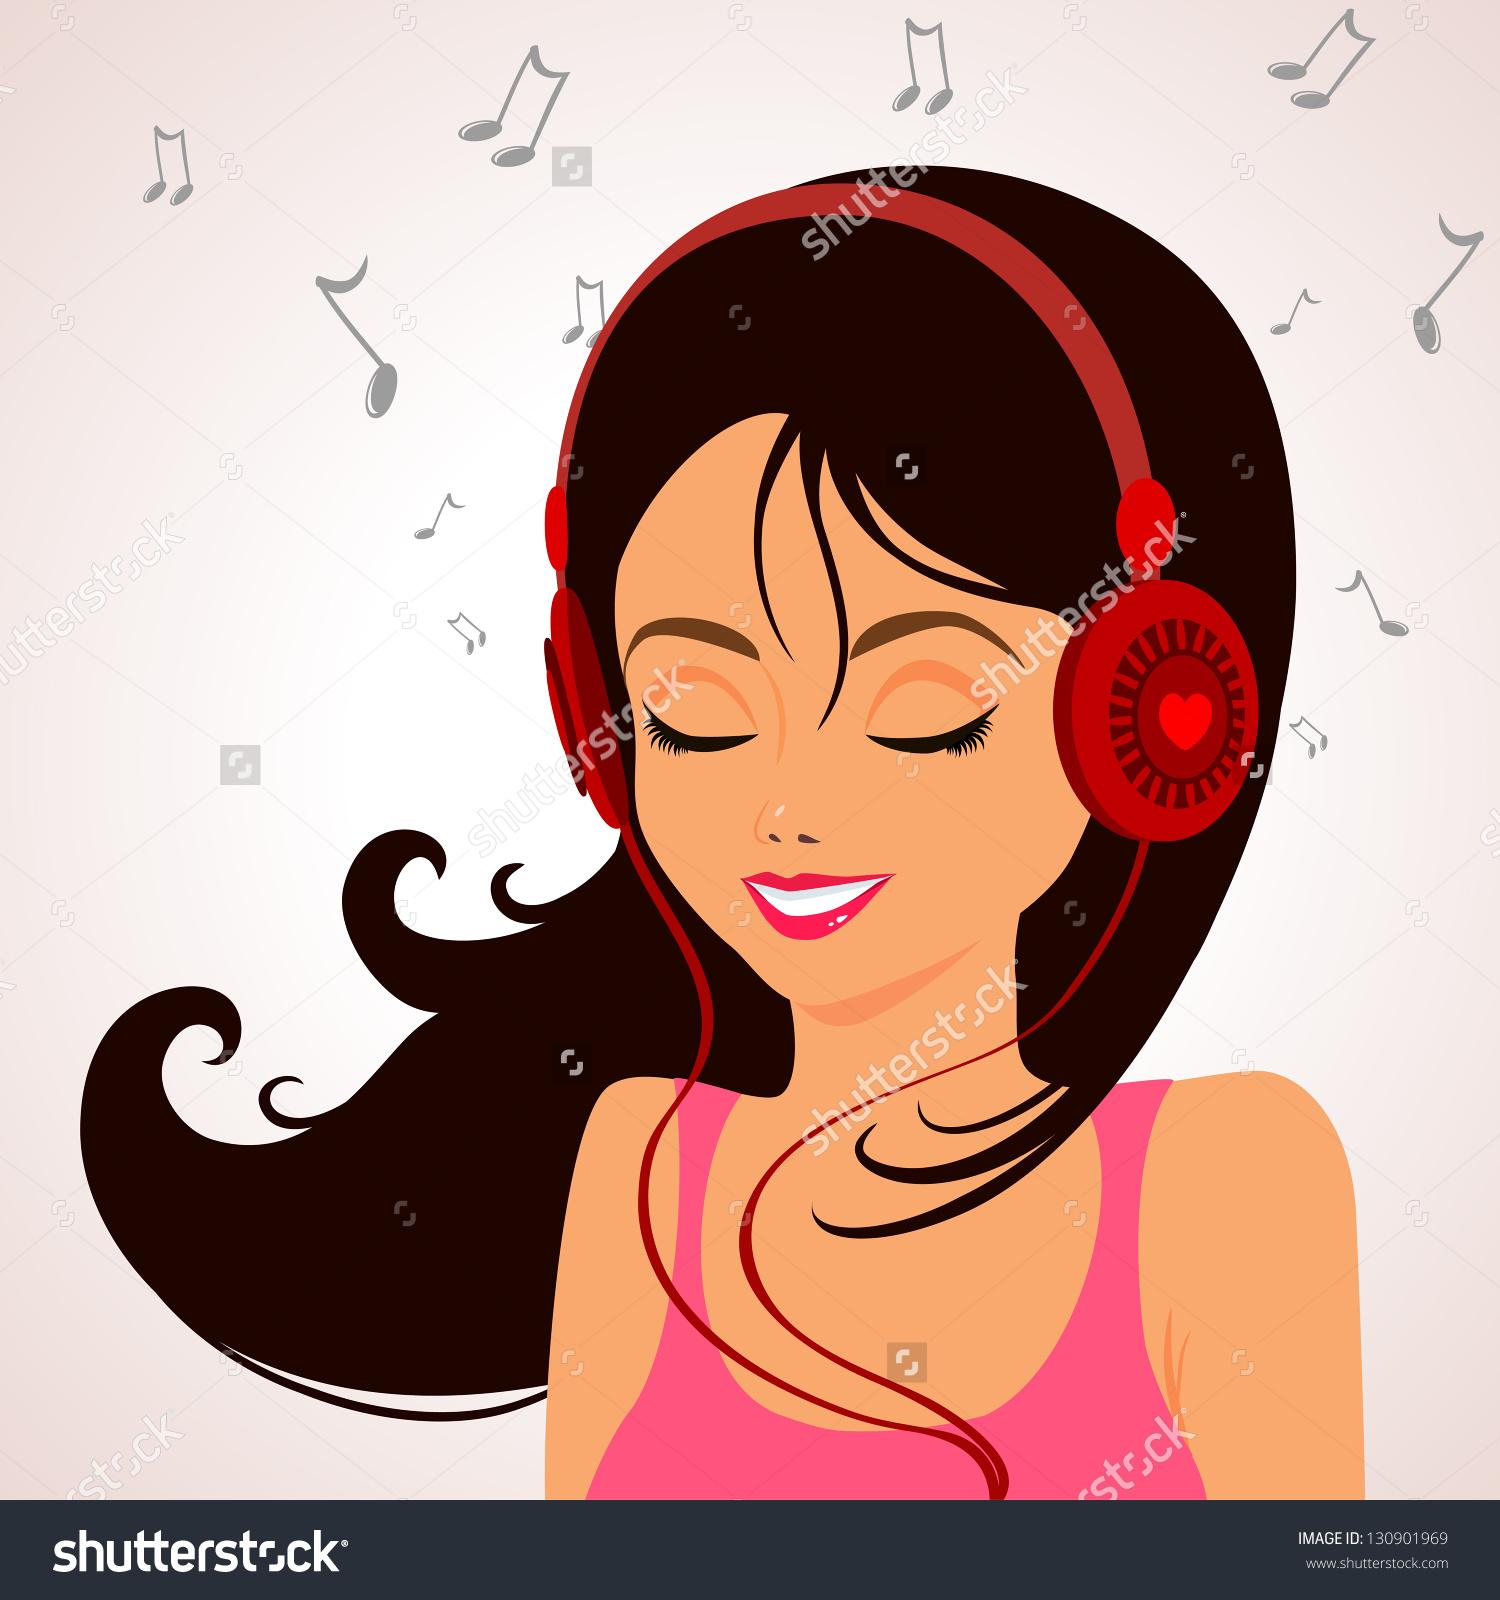 Headphone clipart orange To Clip Music Download Headphones